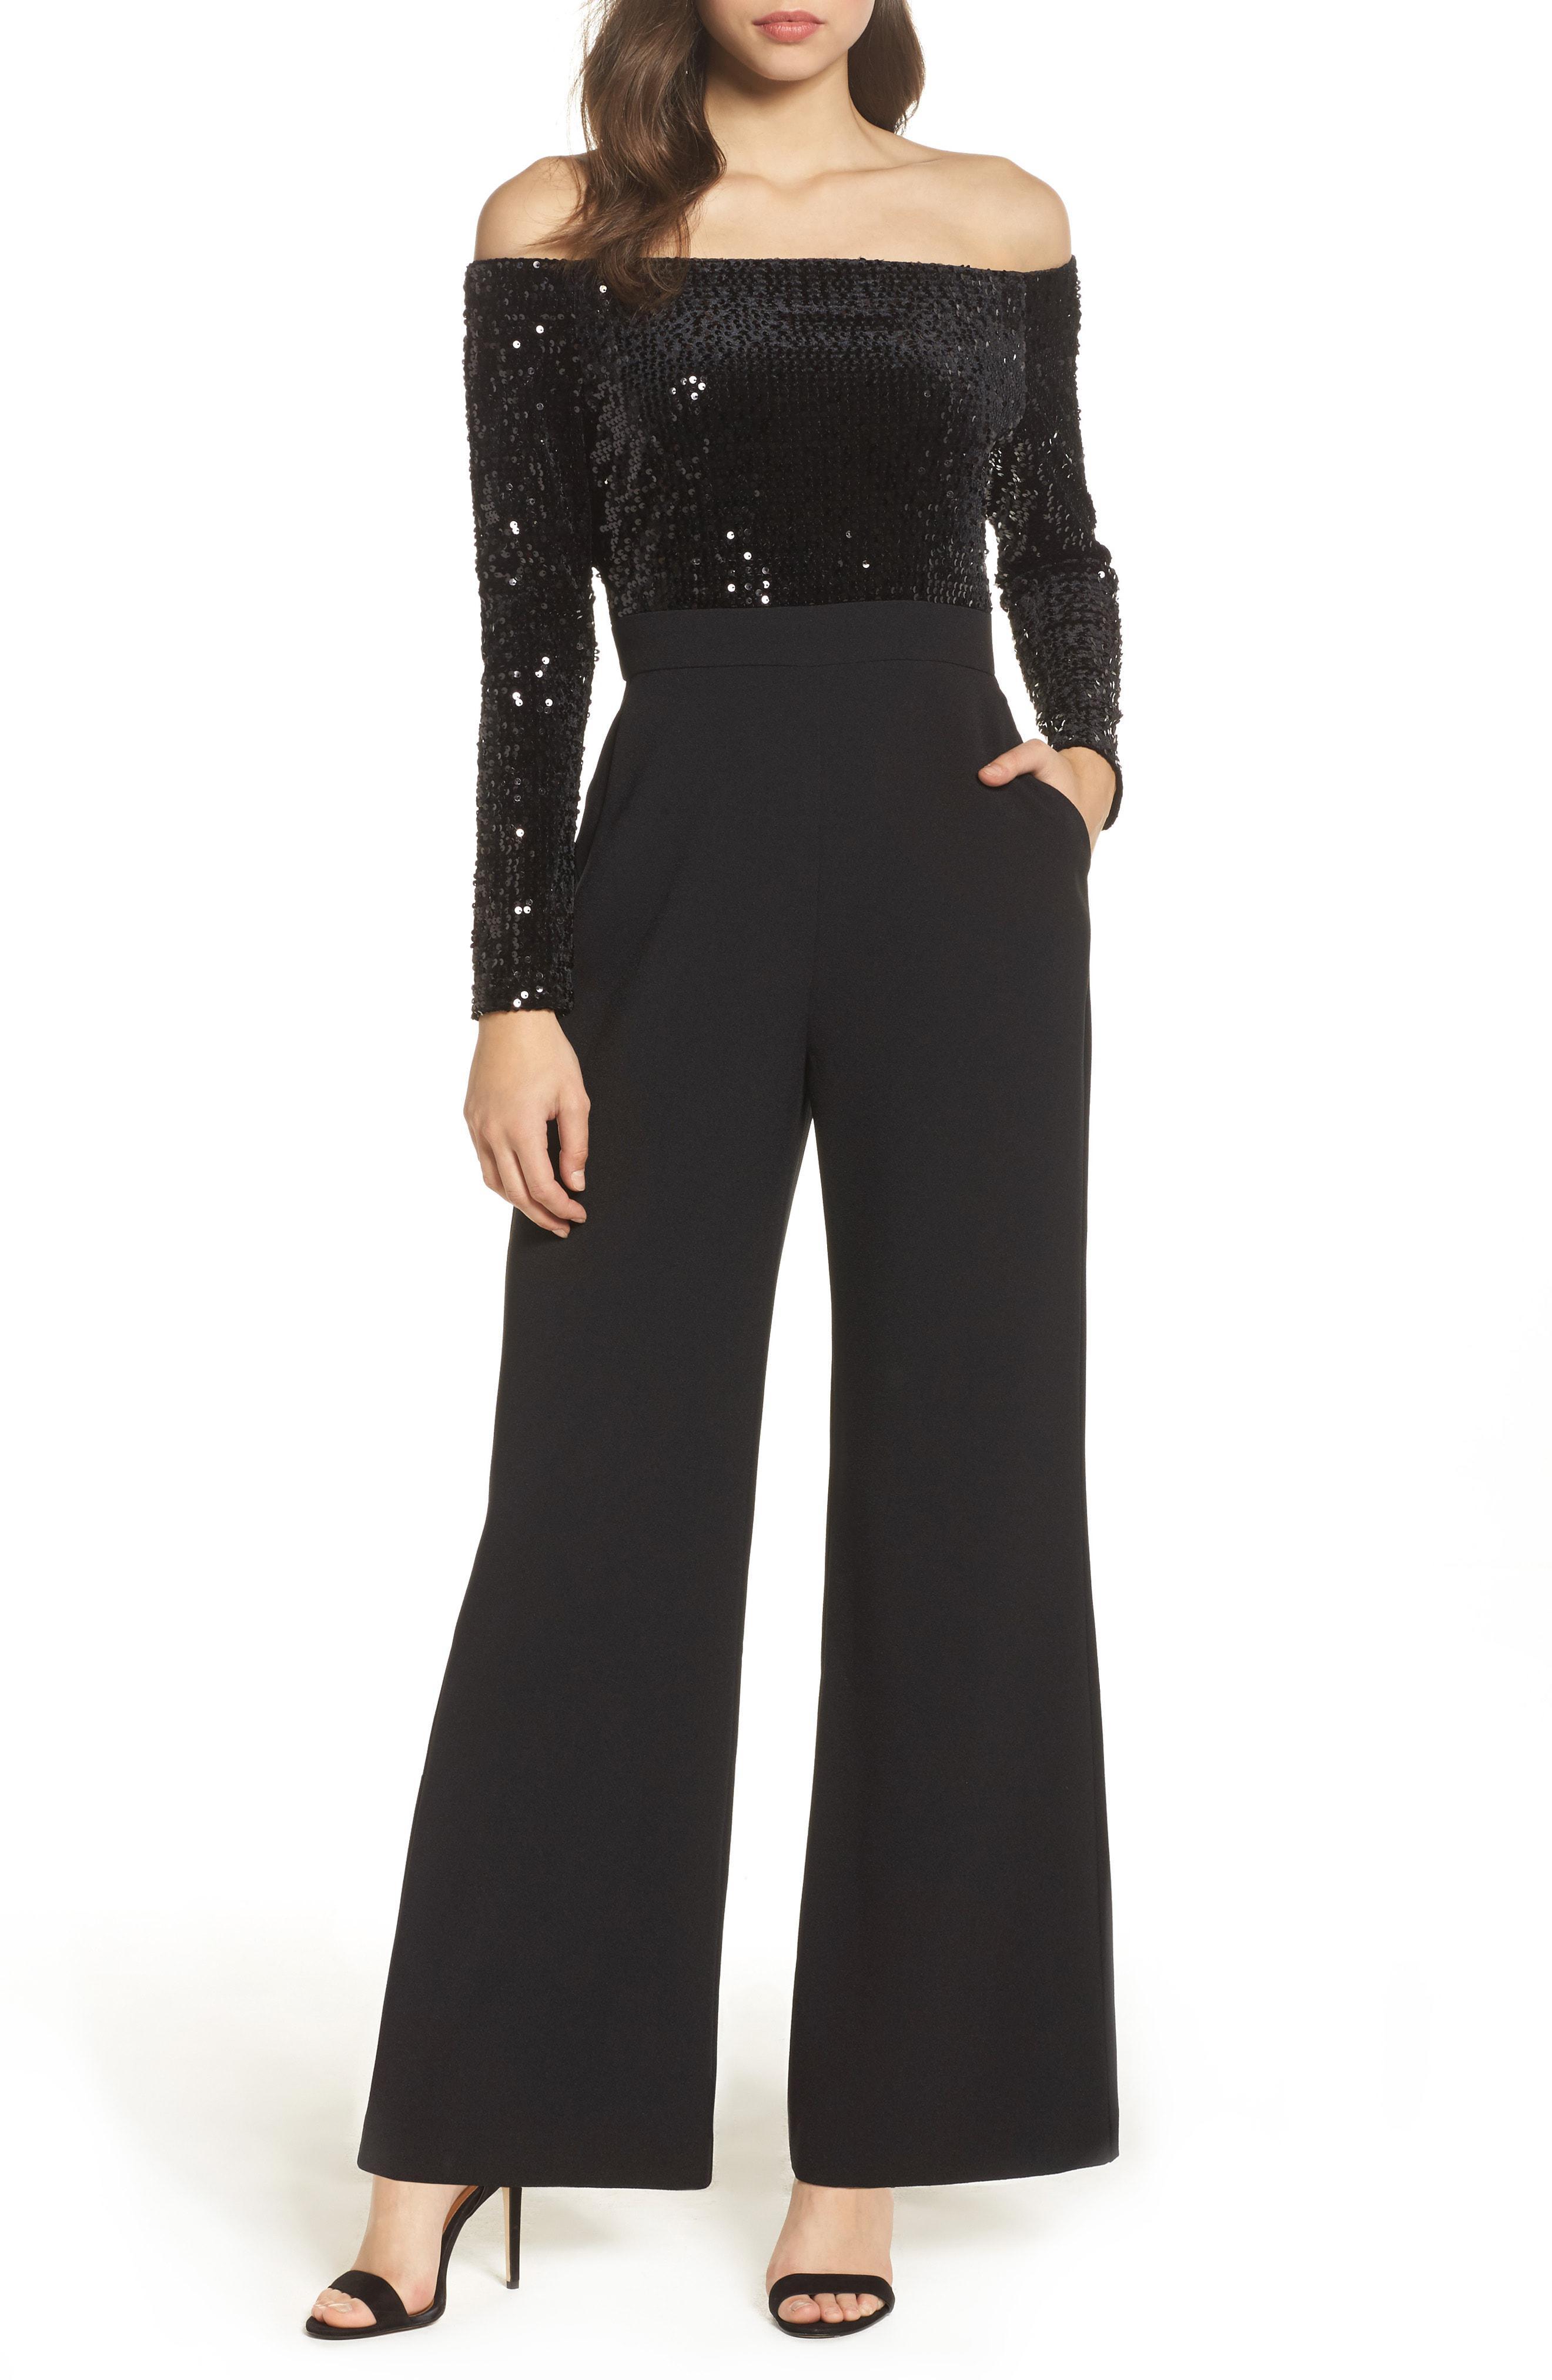 cfb752a7e1666 Lyst - Eliza J Off The Shoulder Wide Leg Jumpsuit in Black - Save 40%